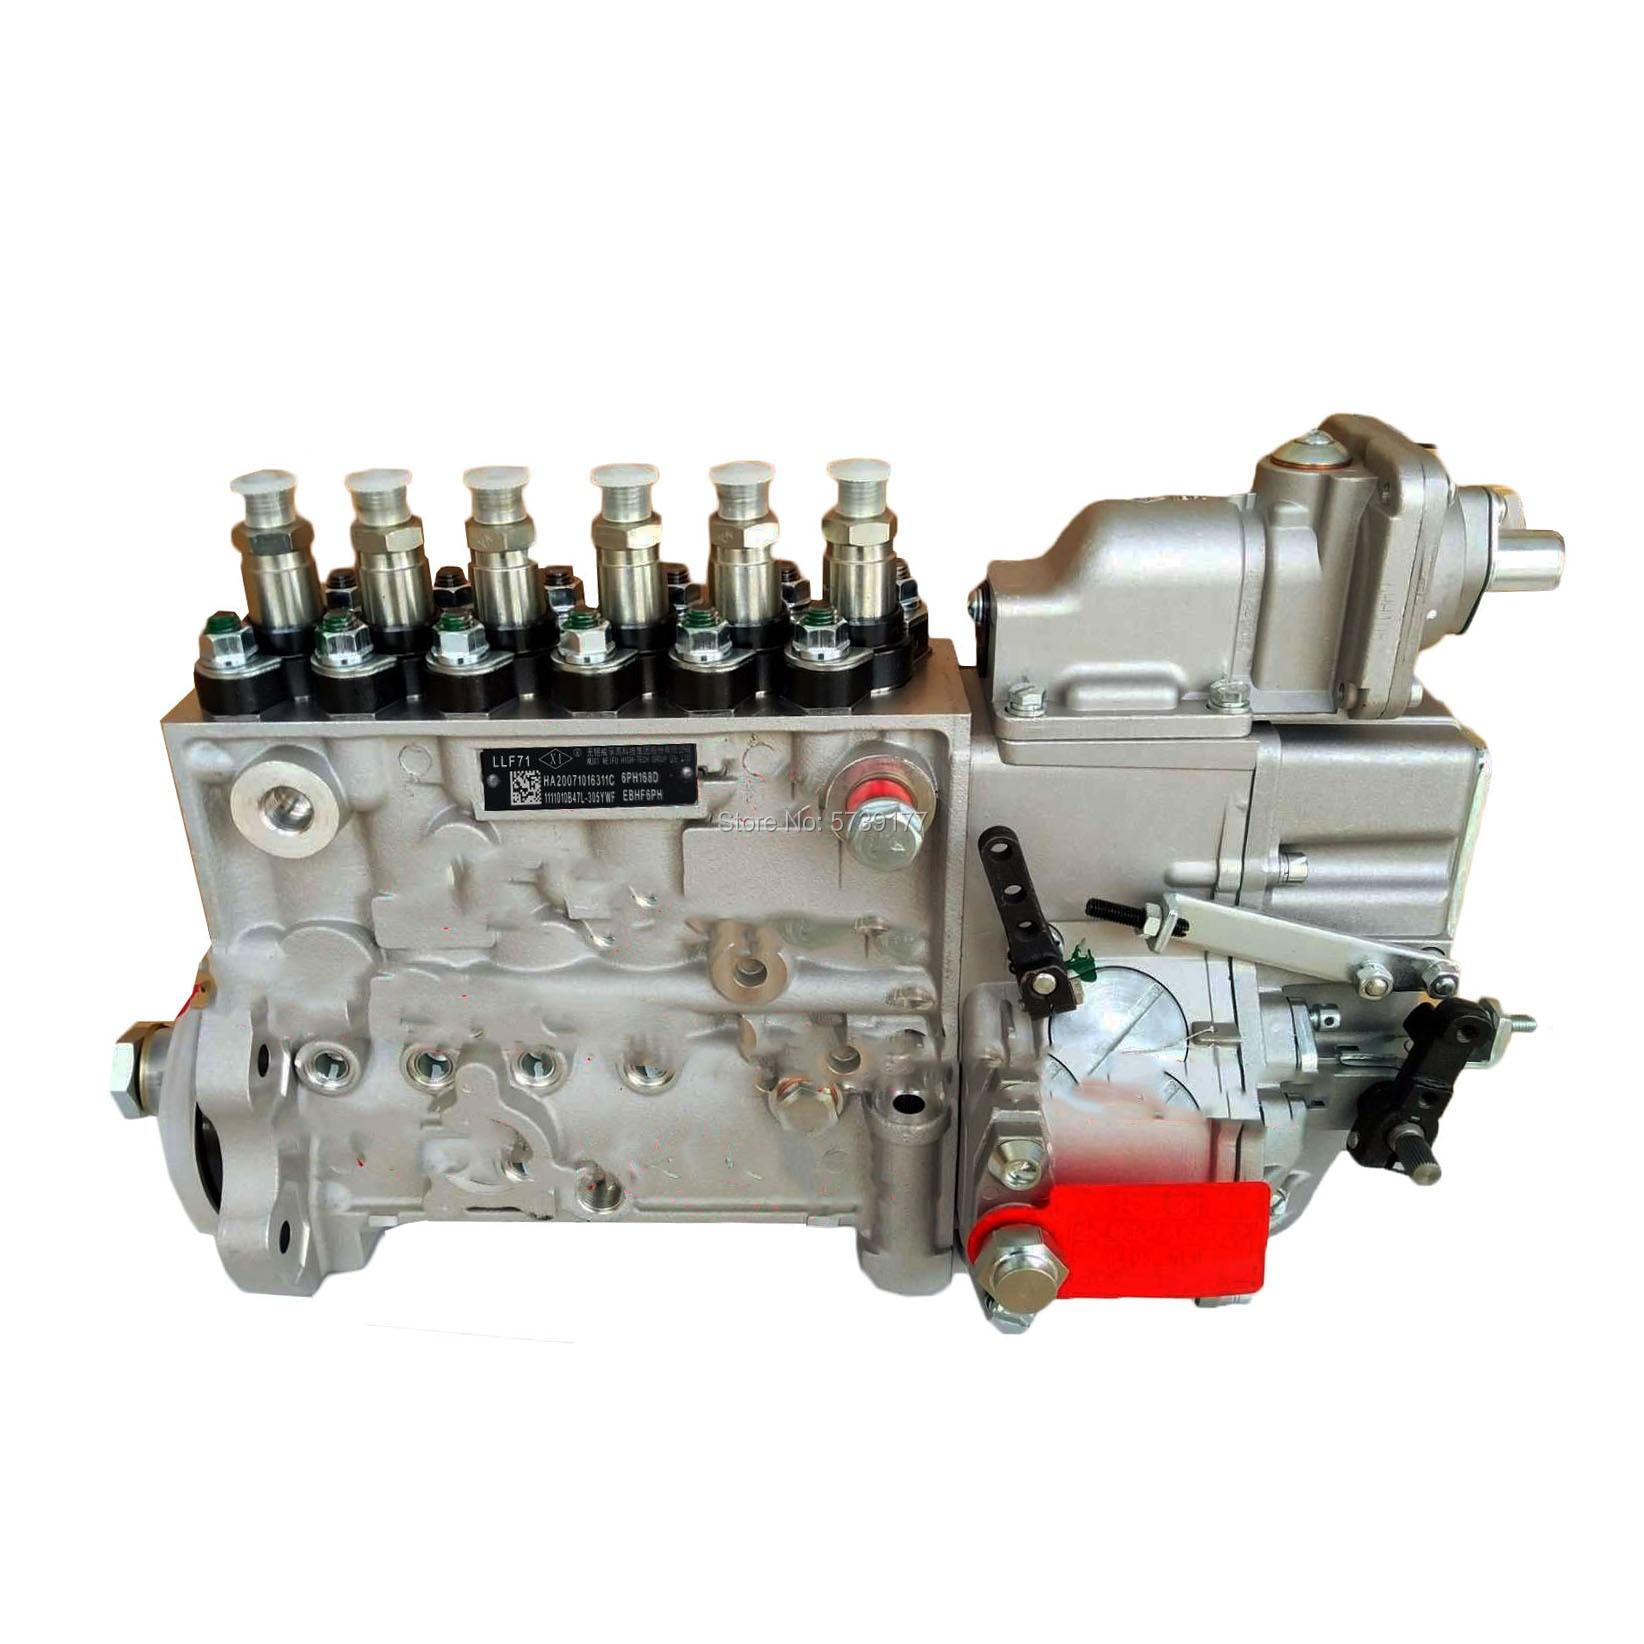 Diesel Engine Parts Weifu Fuel Injection Pump For Doosan excavator 106675-461K/106675-466K 6P734